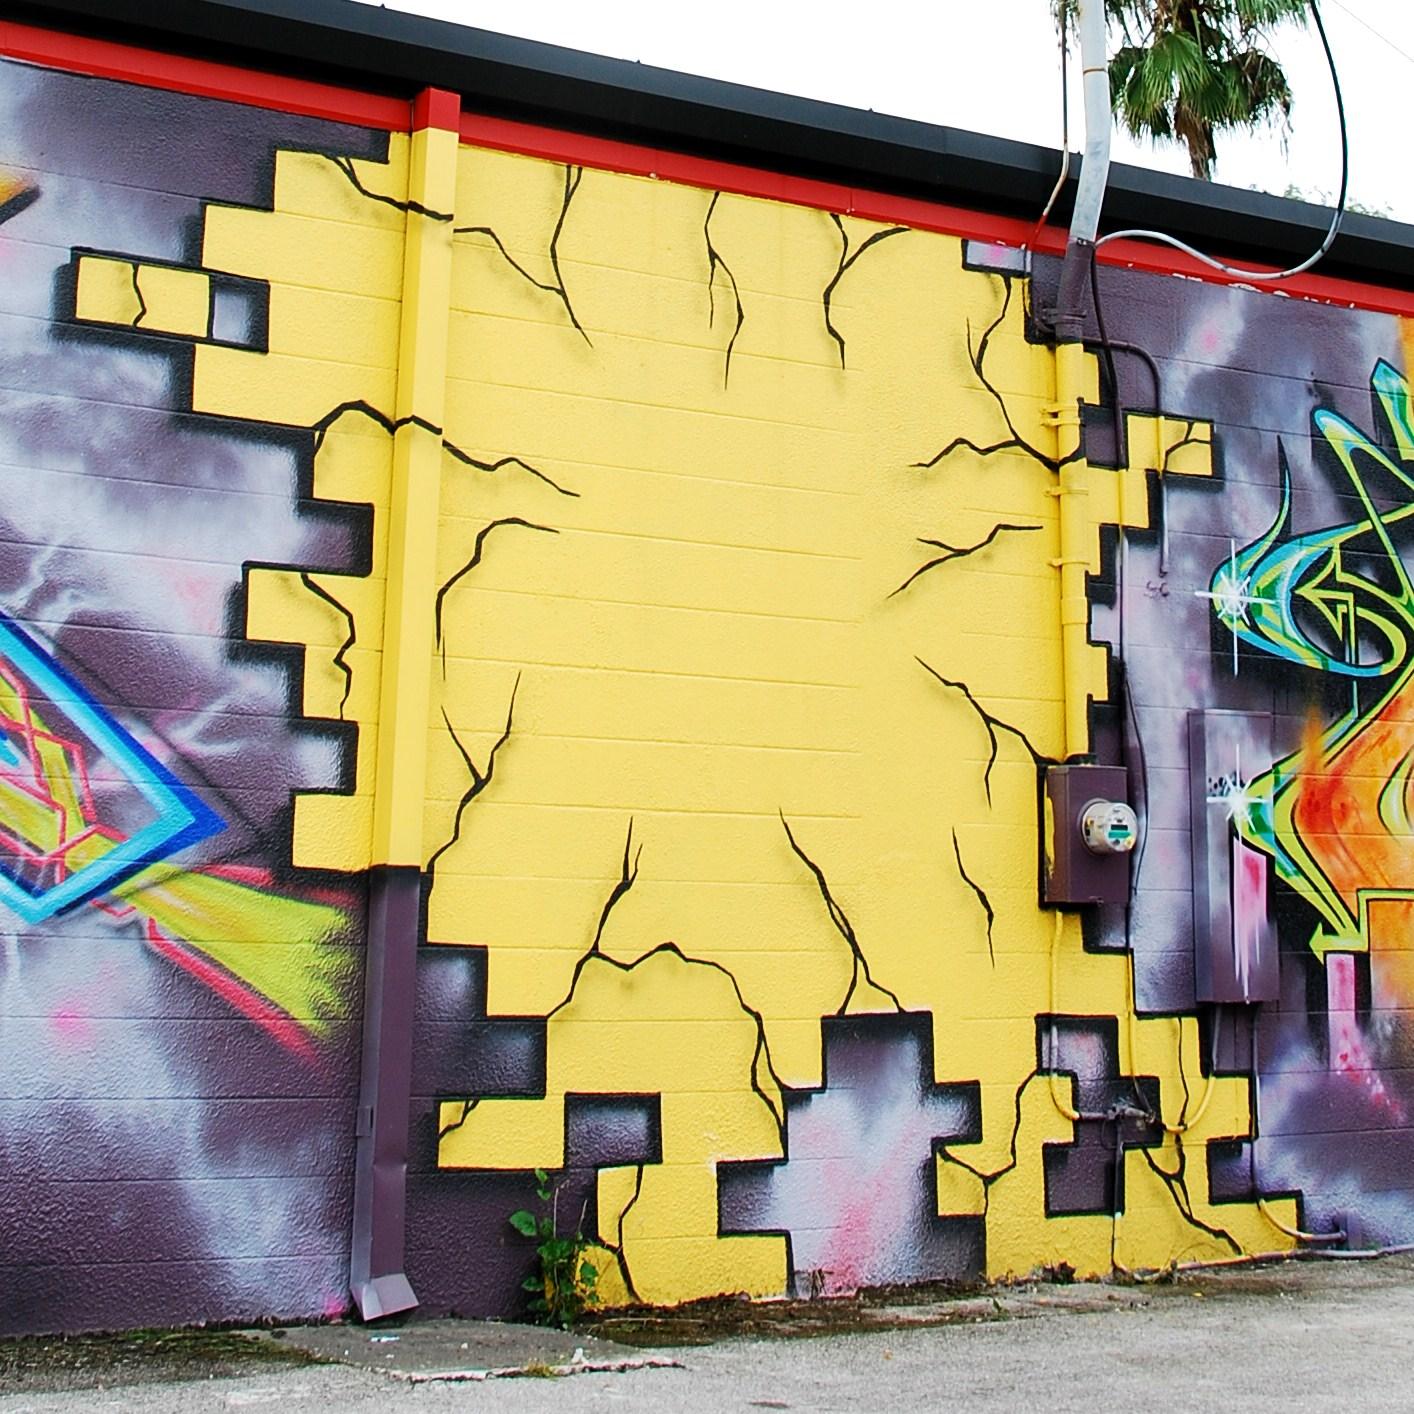 Tampa Florida Photo: Wall Murals Rock, Dude!